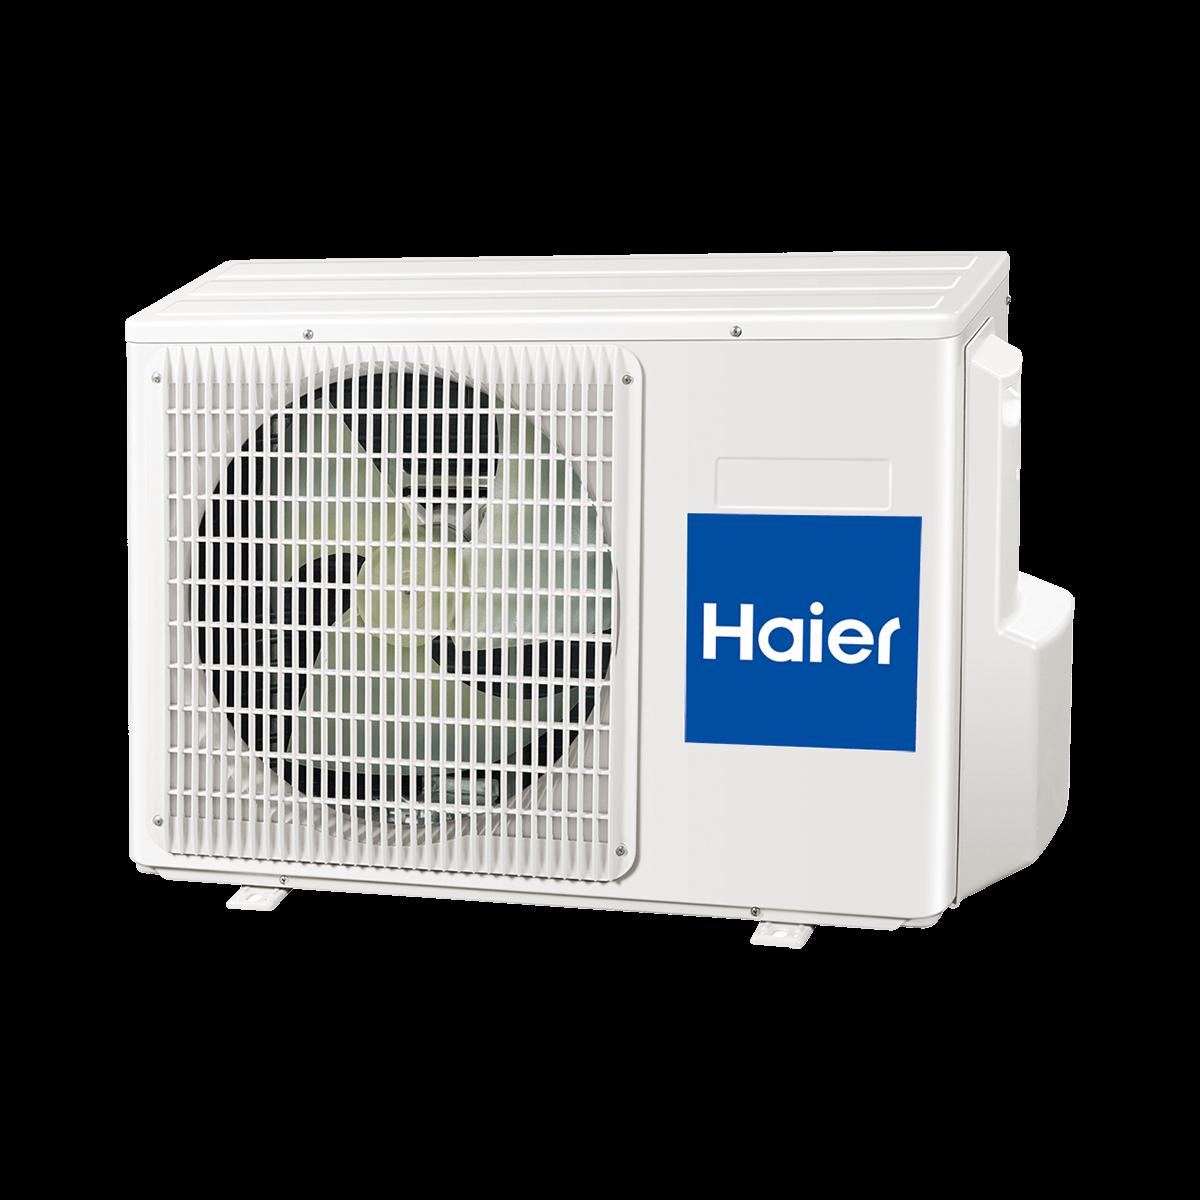 Сплит-система Haier HSU-24HEK203/R2(DB) / HSU-24HEK203/R2(DB)